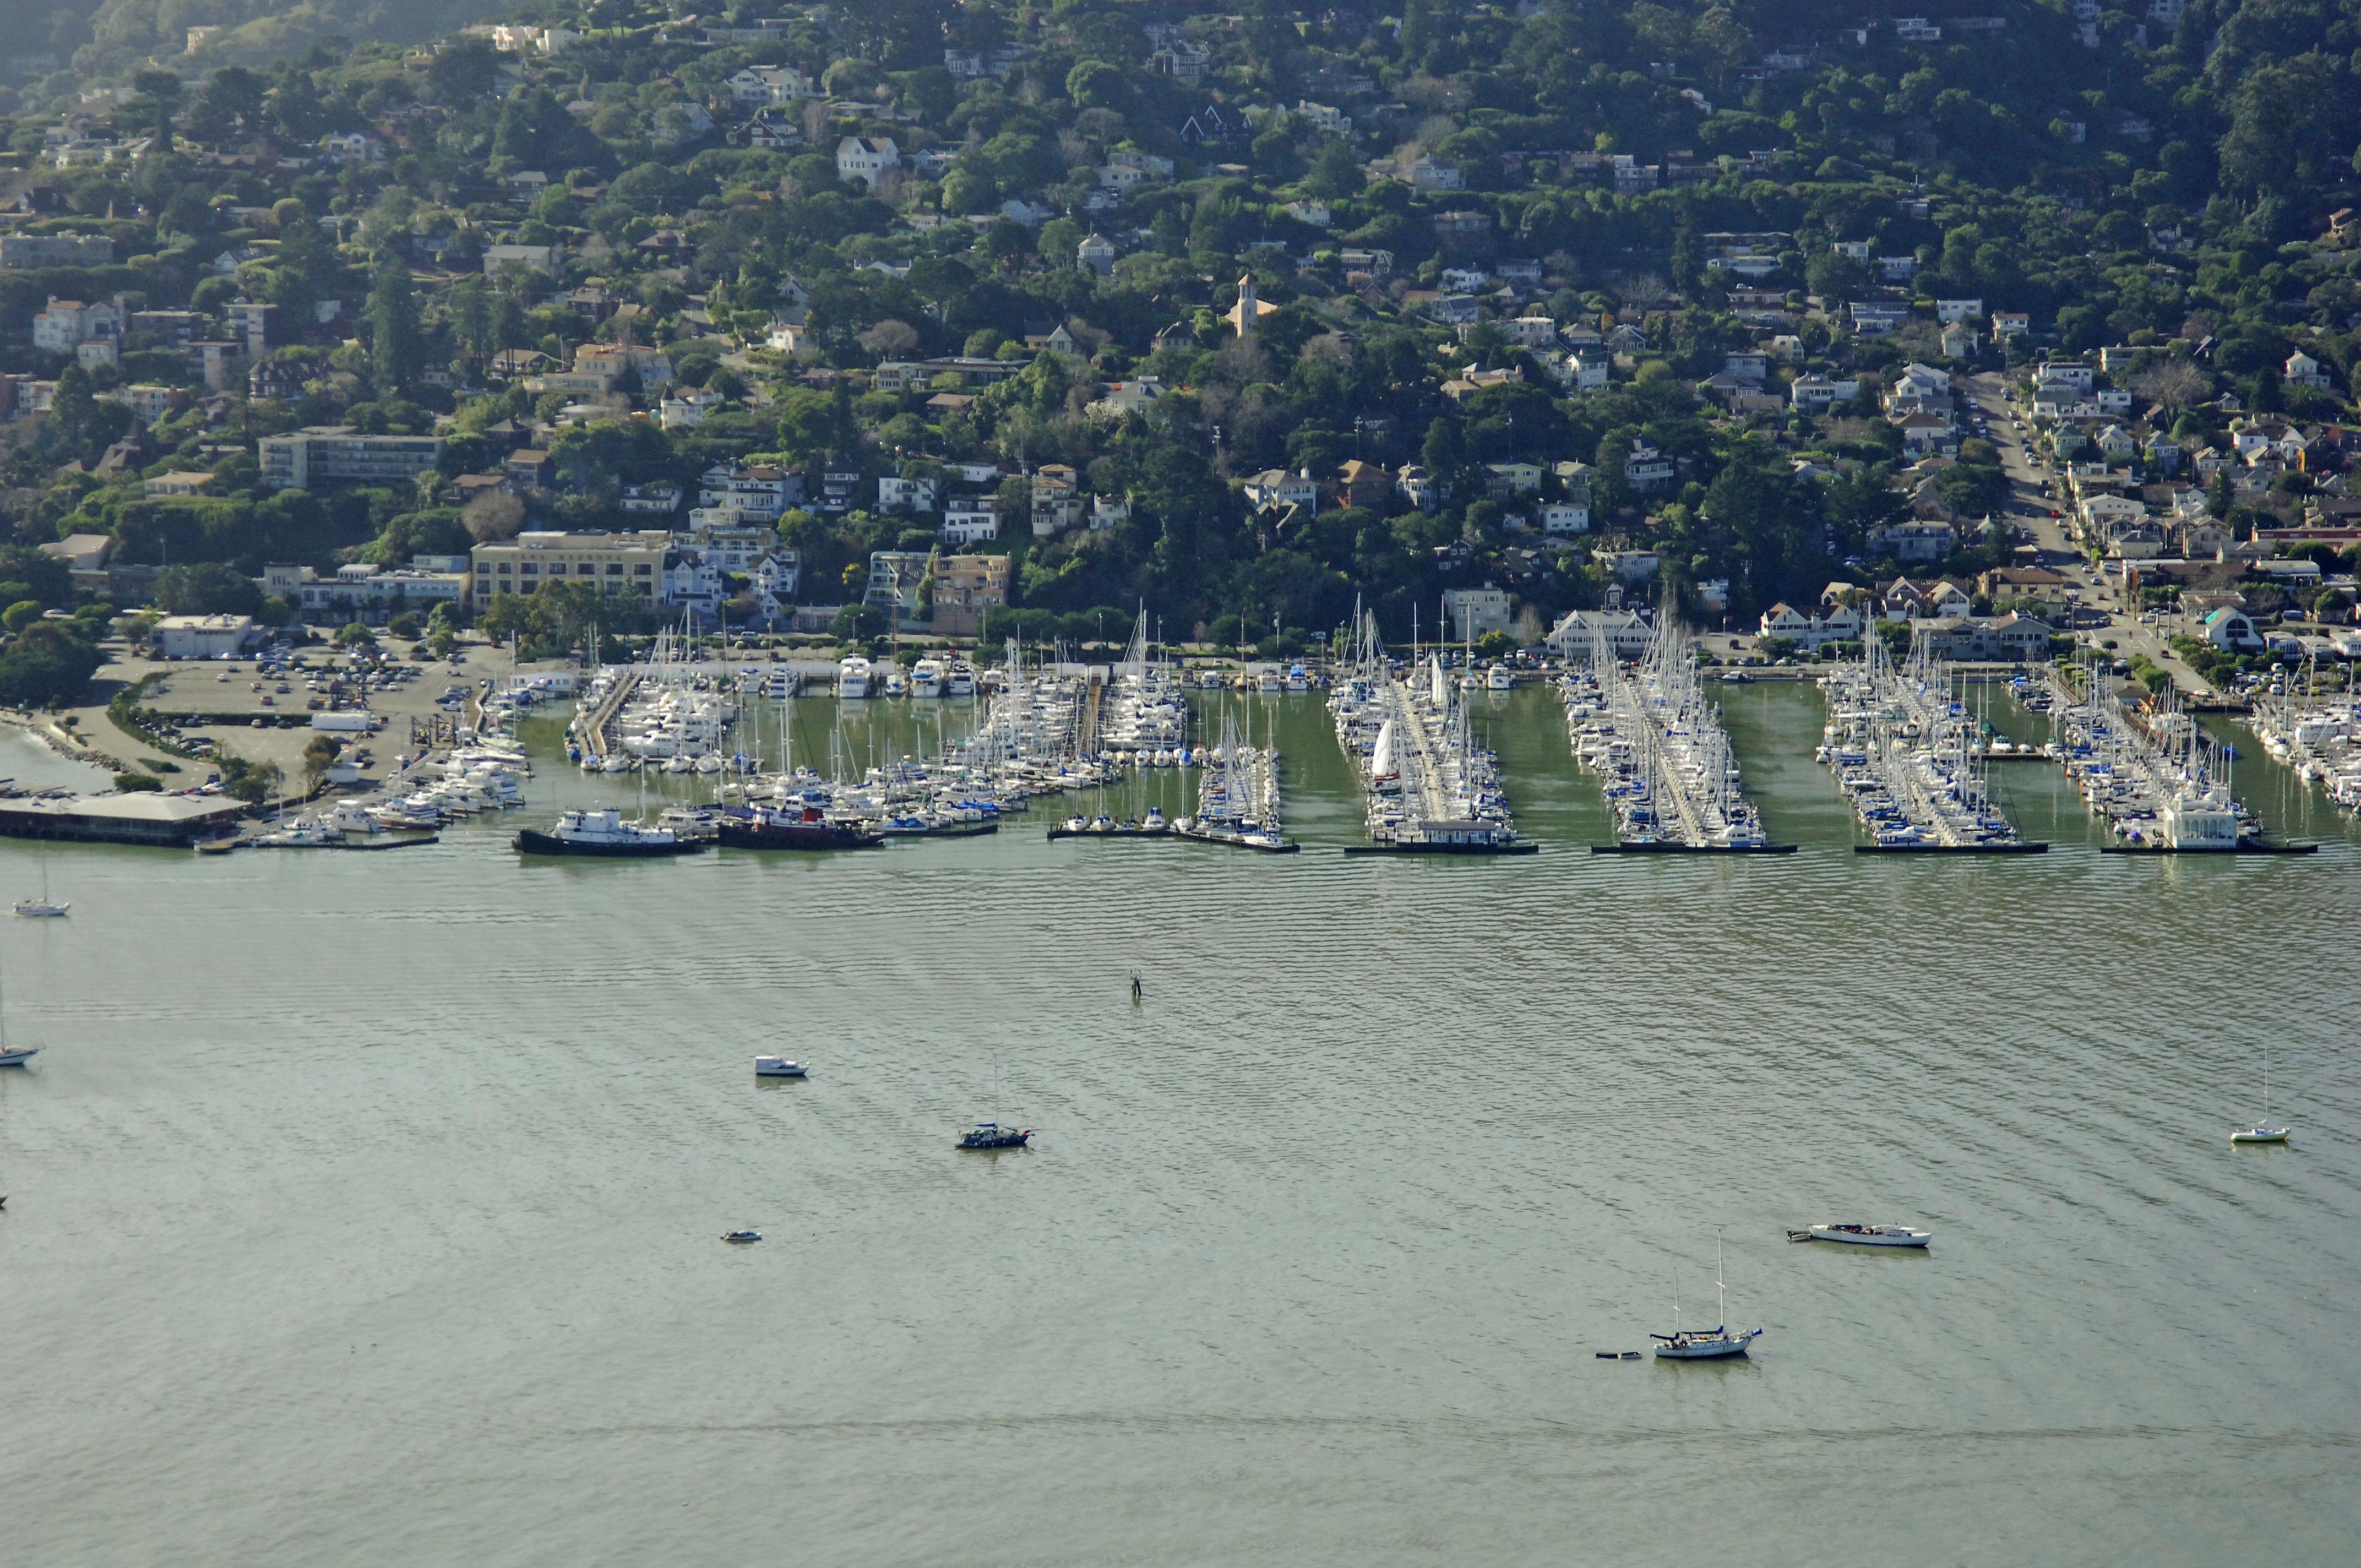 Sausalito Yacht Harbor in Sausalito, CA, United States